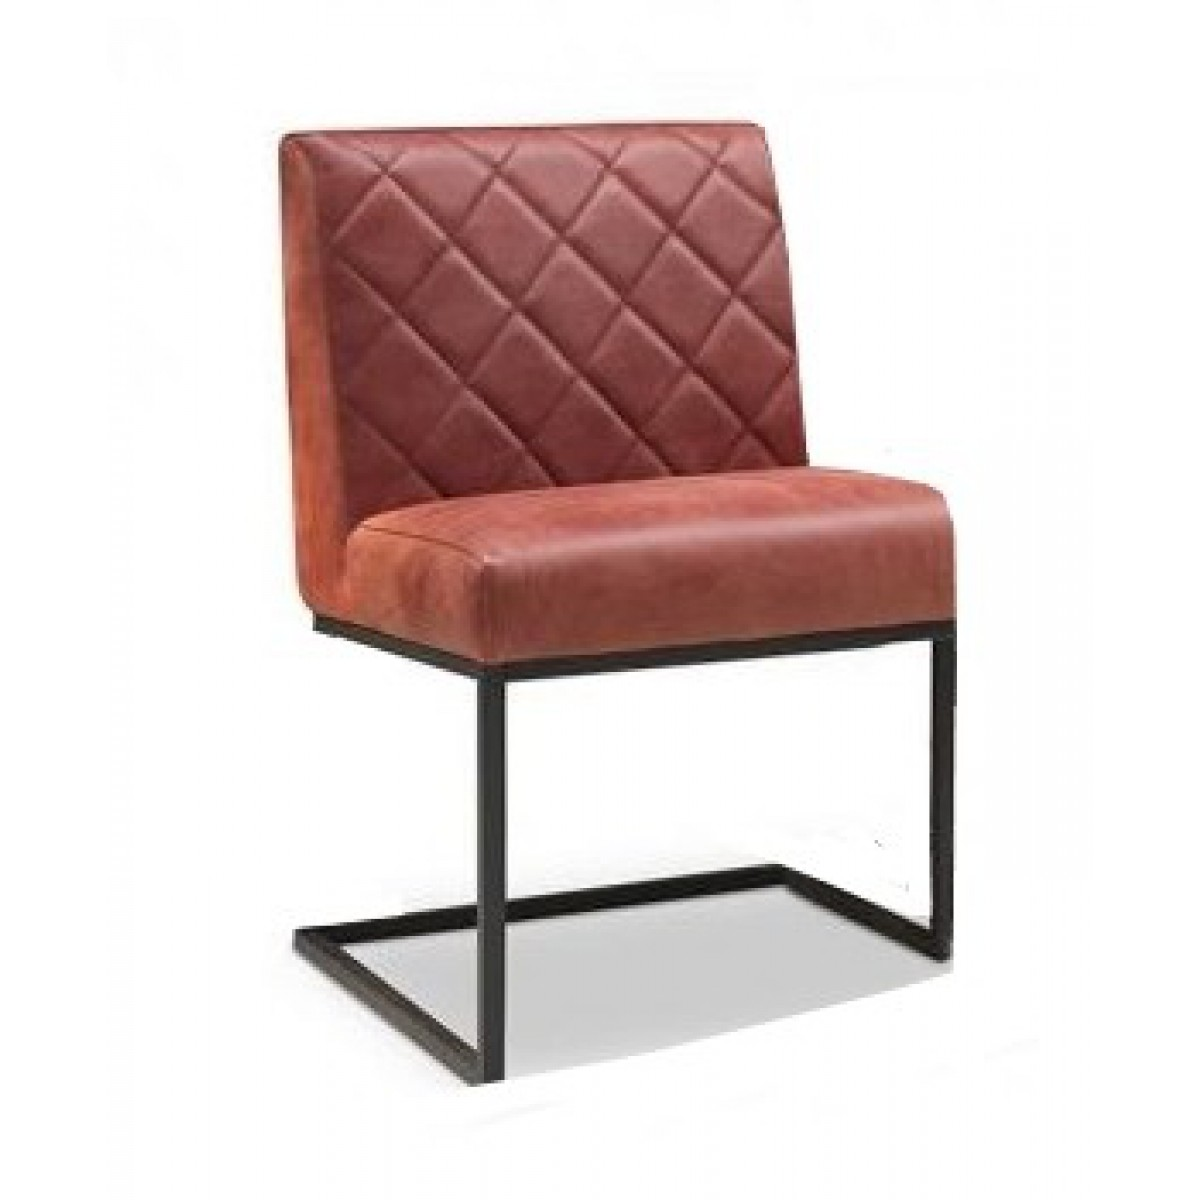 lara-steps-stoel-eetkamerstoel-africa-theater-rood